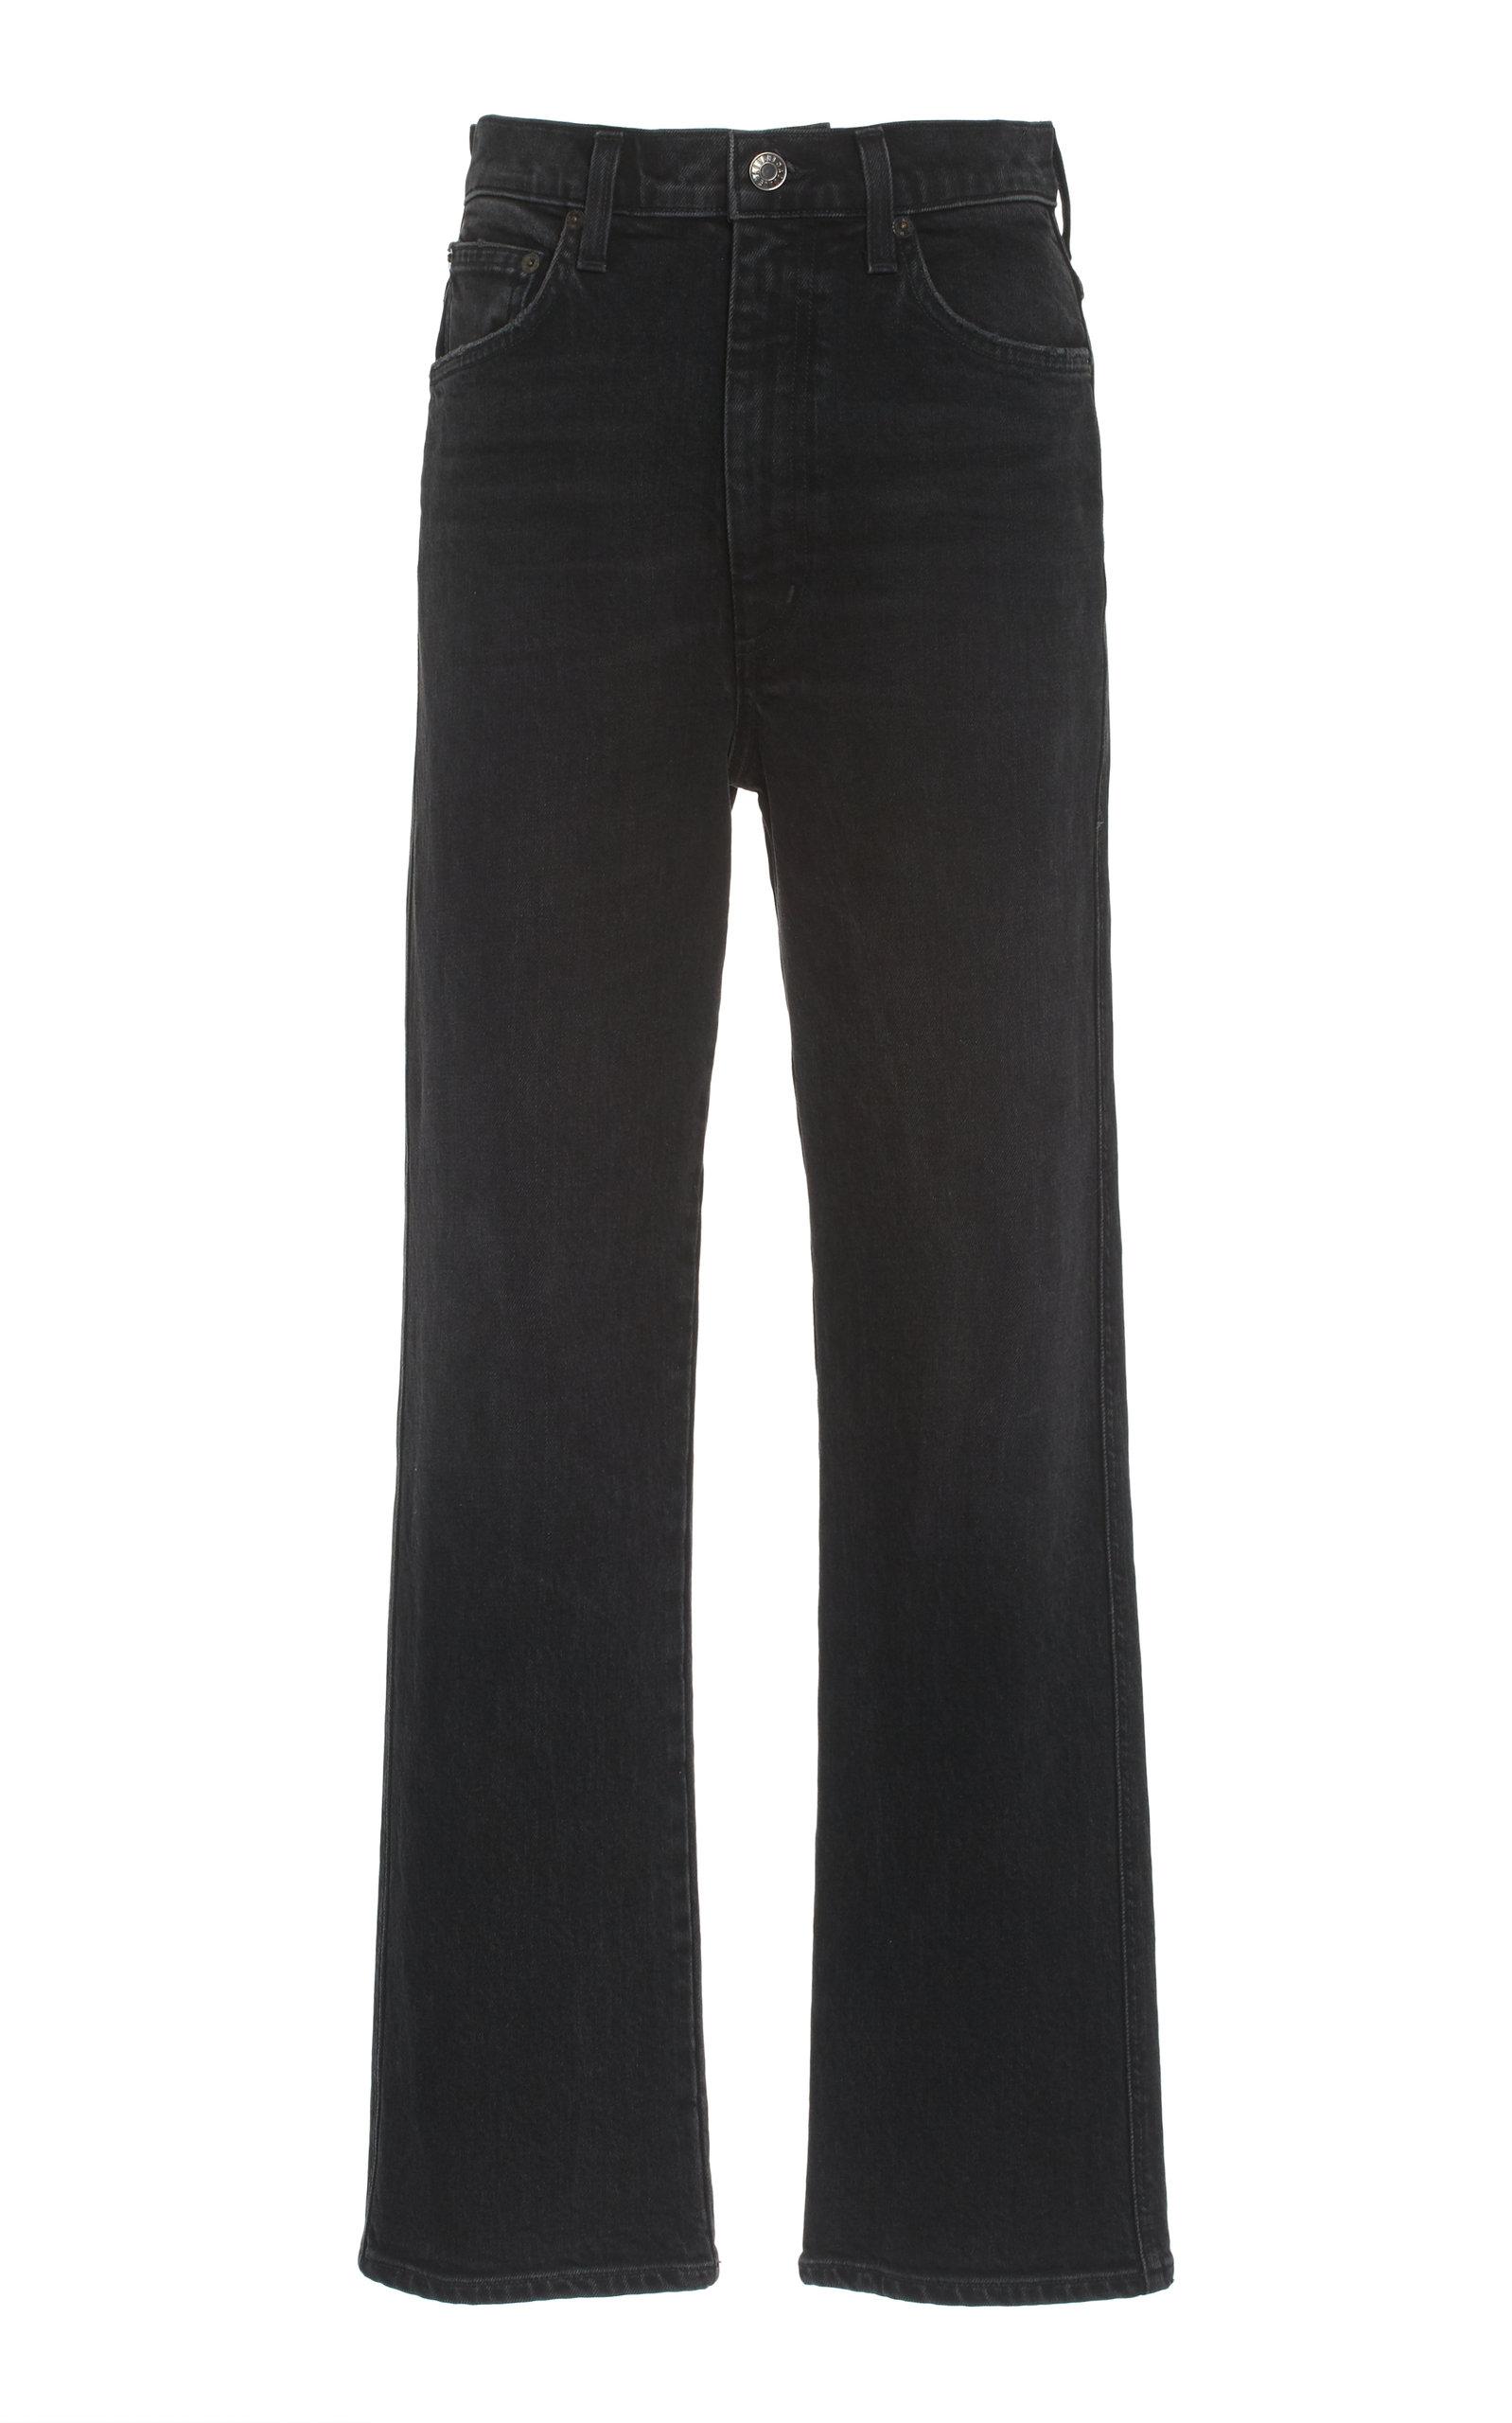 Agolde - Women's Pinch-Waist Stretched Ultra High-Rise Skinny-Leg Jeans - Grey - Moda Operandi